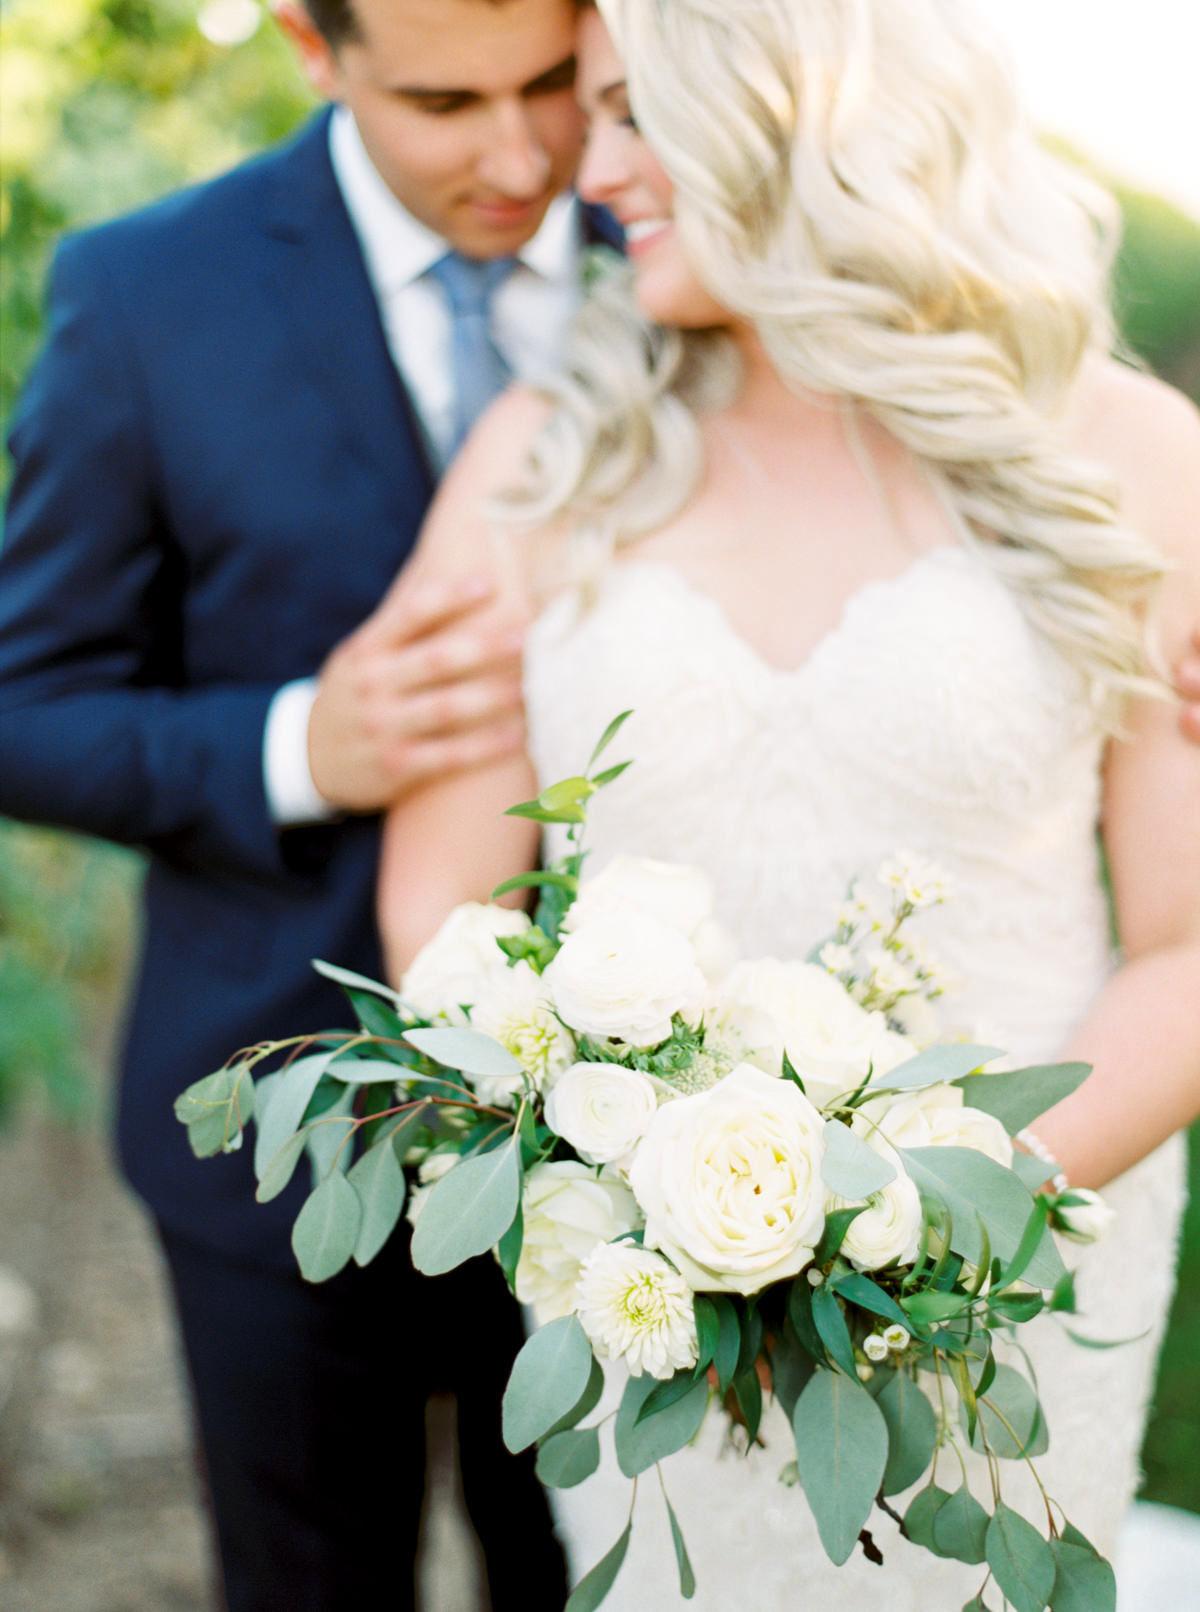 vineyard-bride-kayla-yestal-outdoor-summer-wedding-honsberger-estate-winery-niagara-toronto-vendor-0038.jpg